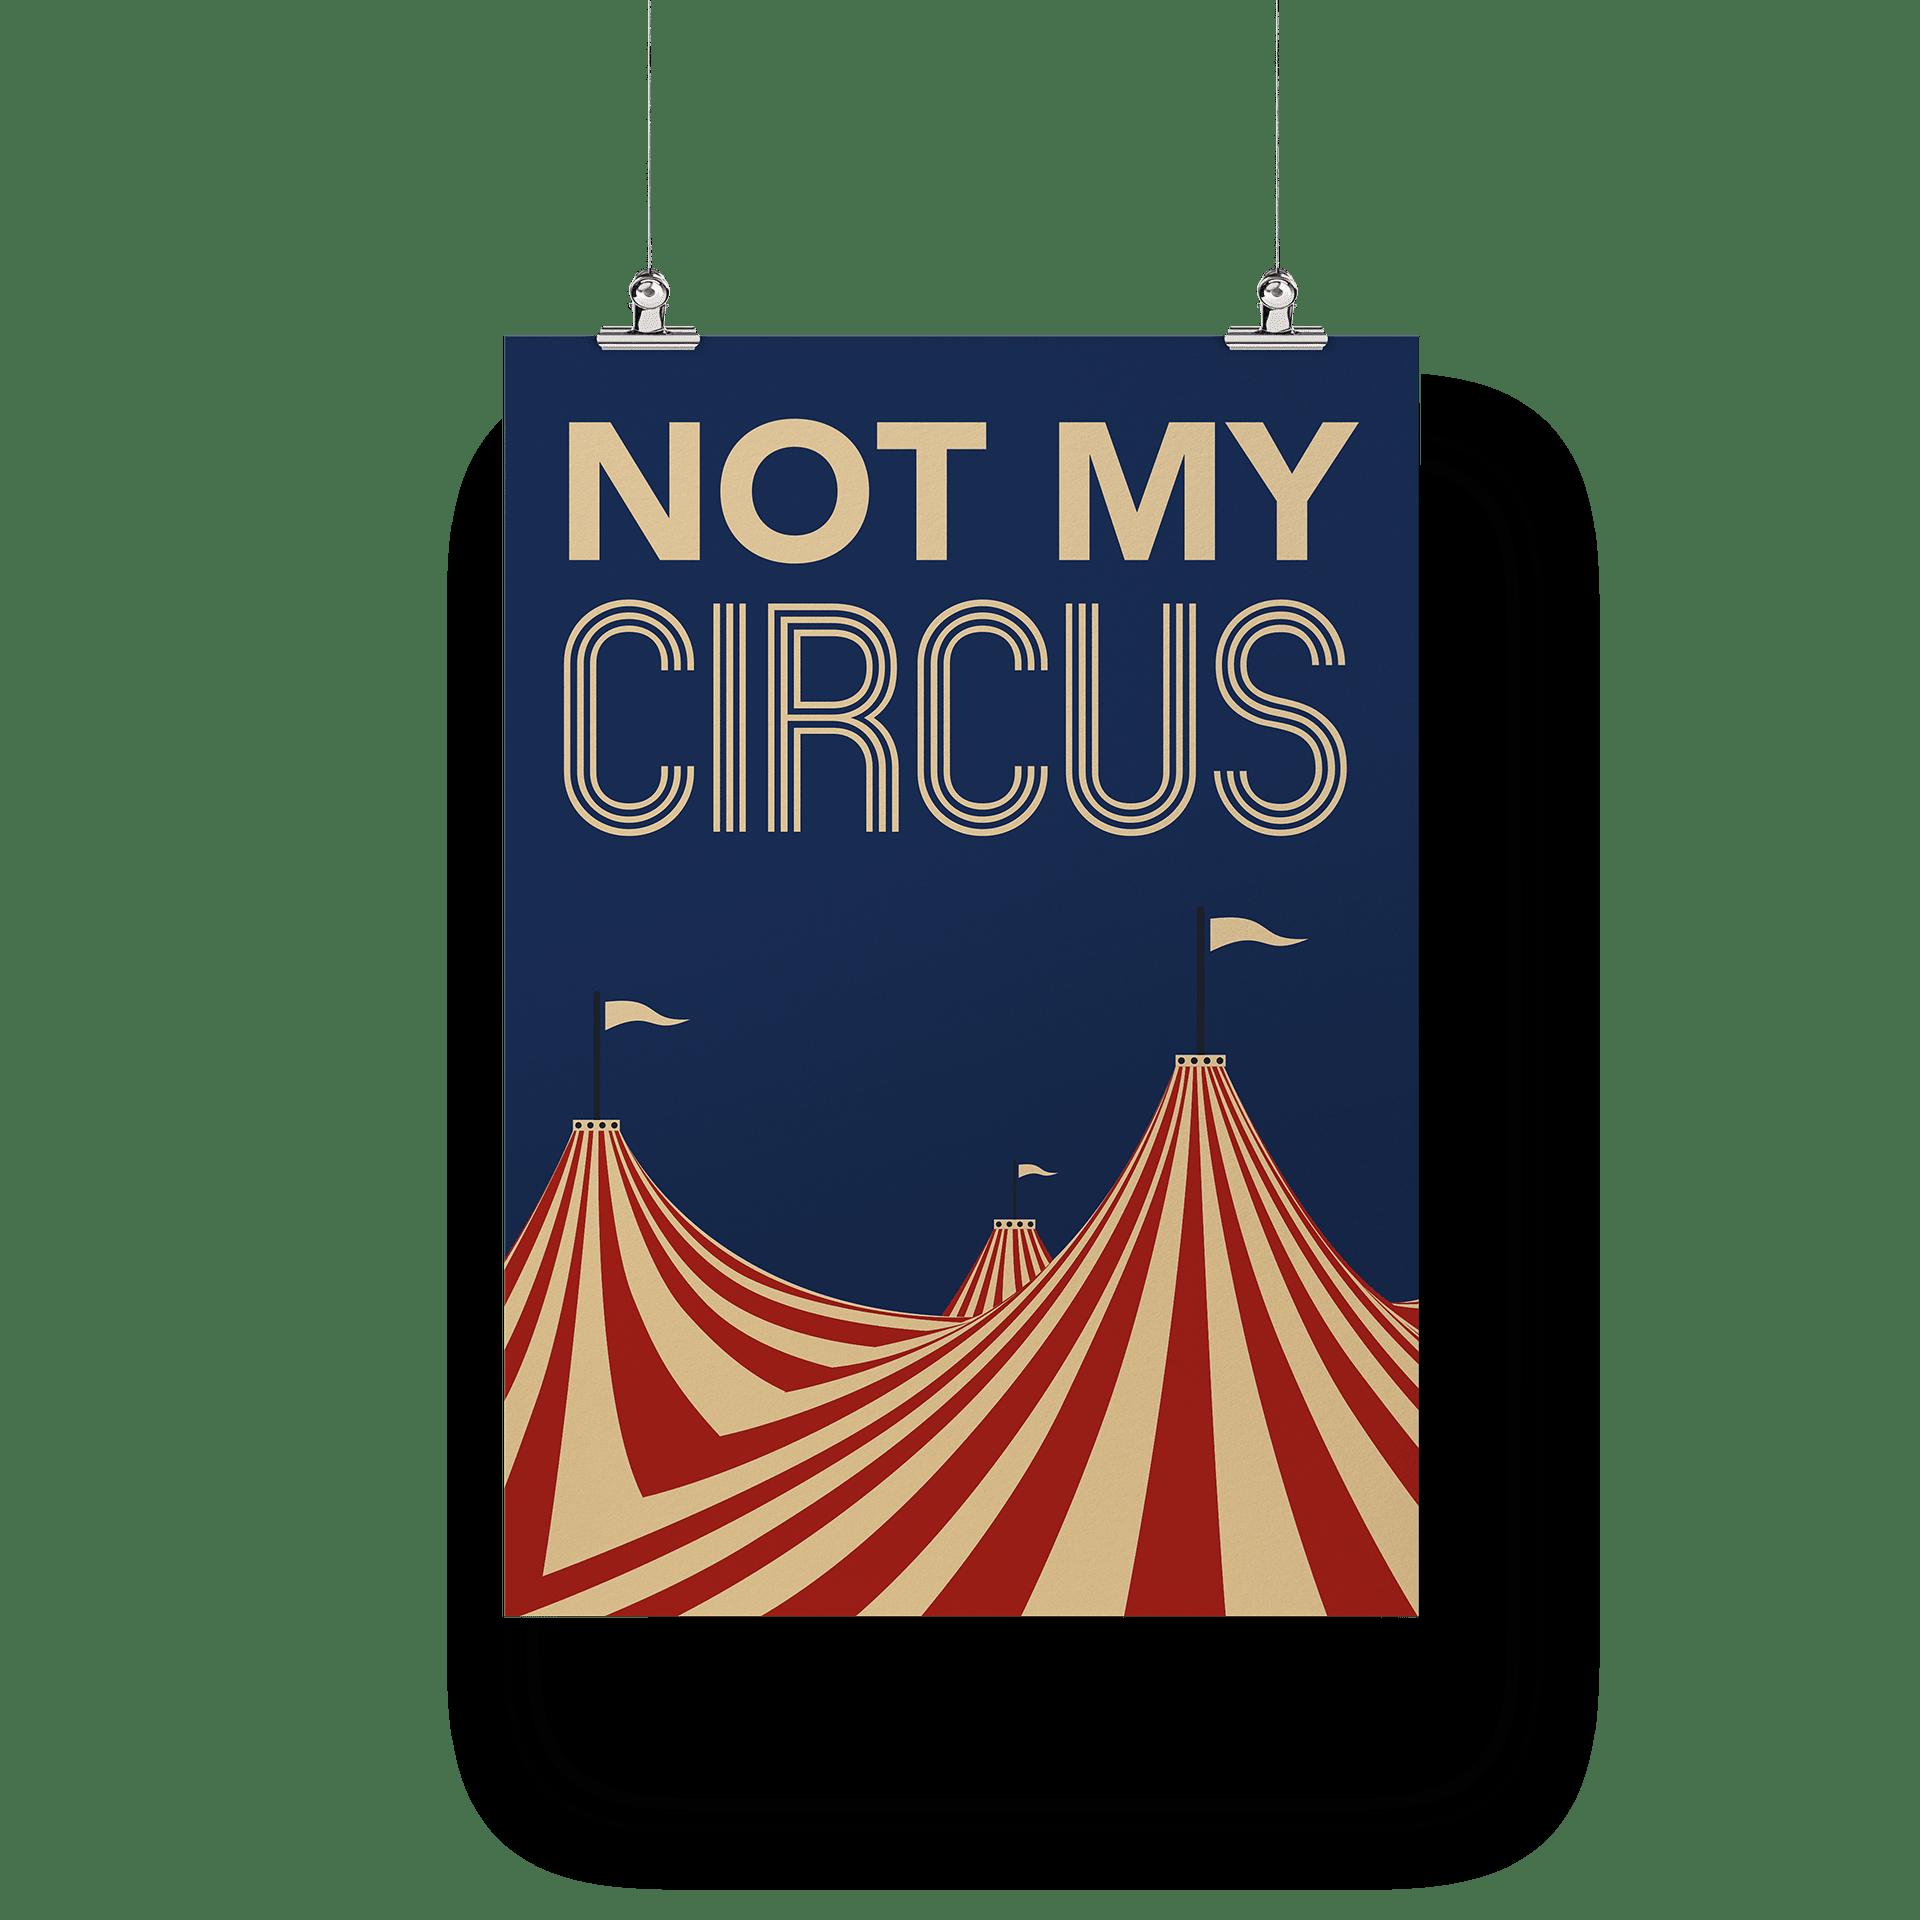 Not my Circus - Poster